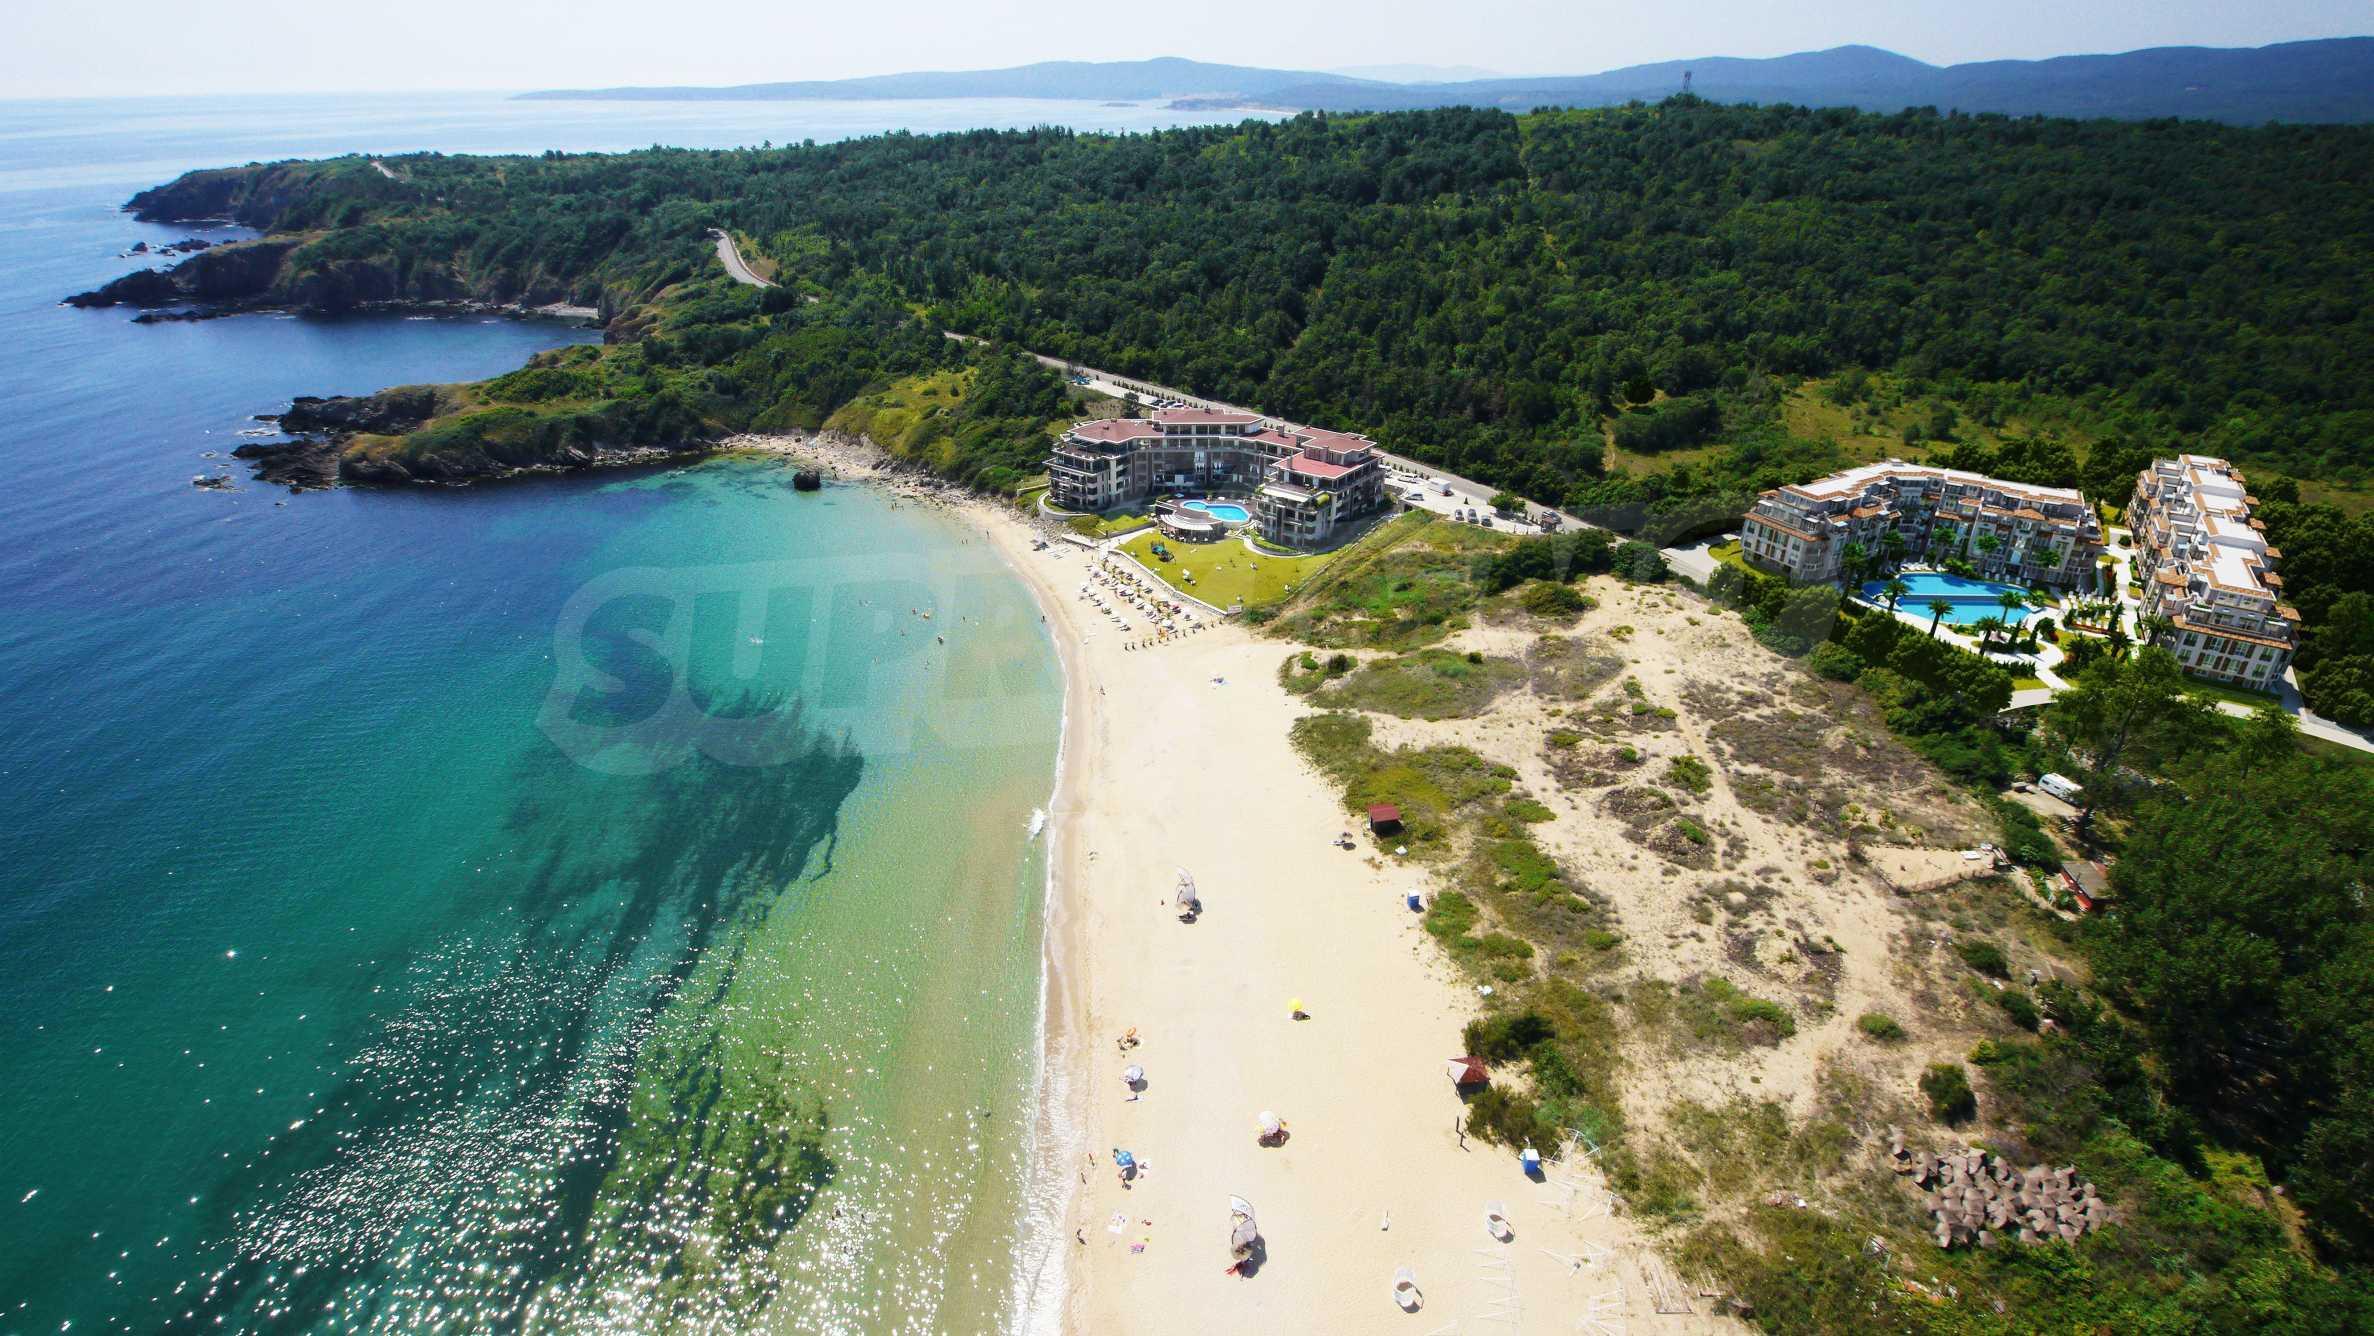 New 1-bedroom apartment in a coastal complex by the Kavatsite Beach (Sozopol) 2